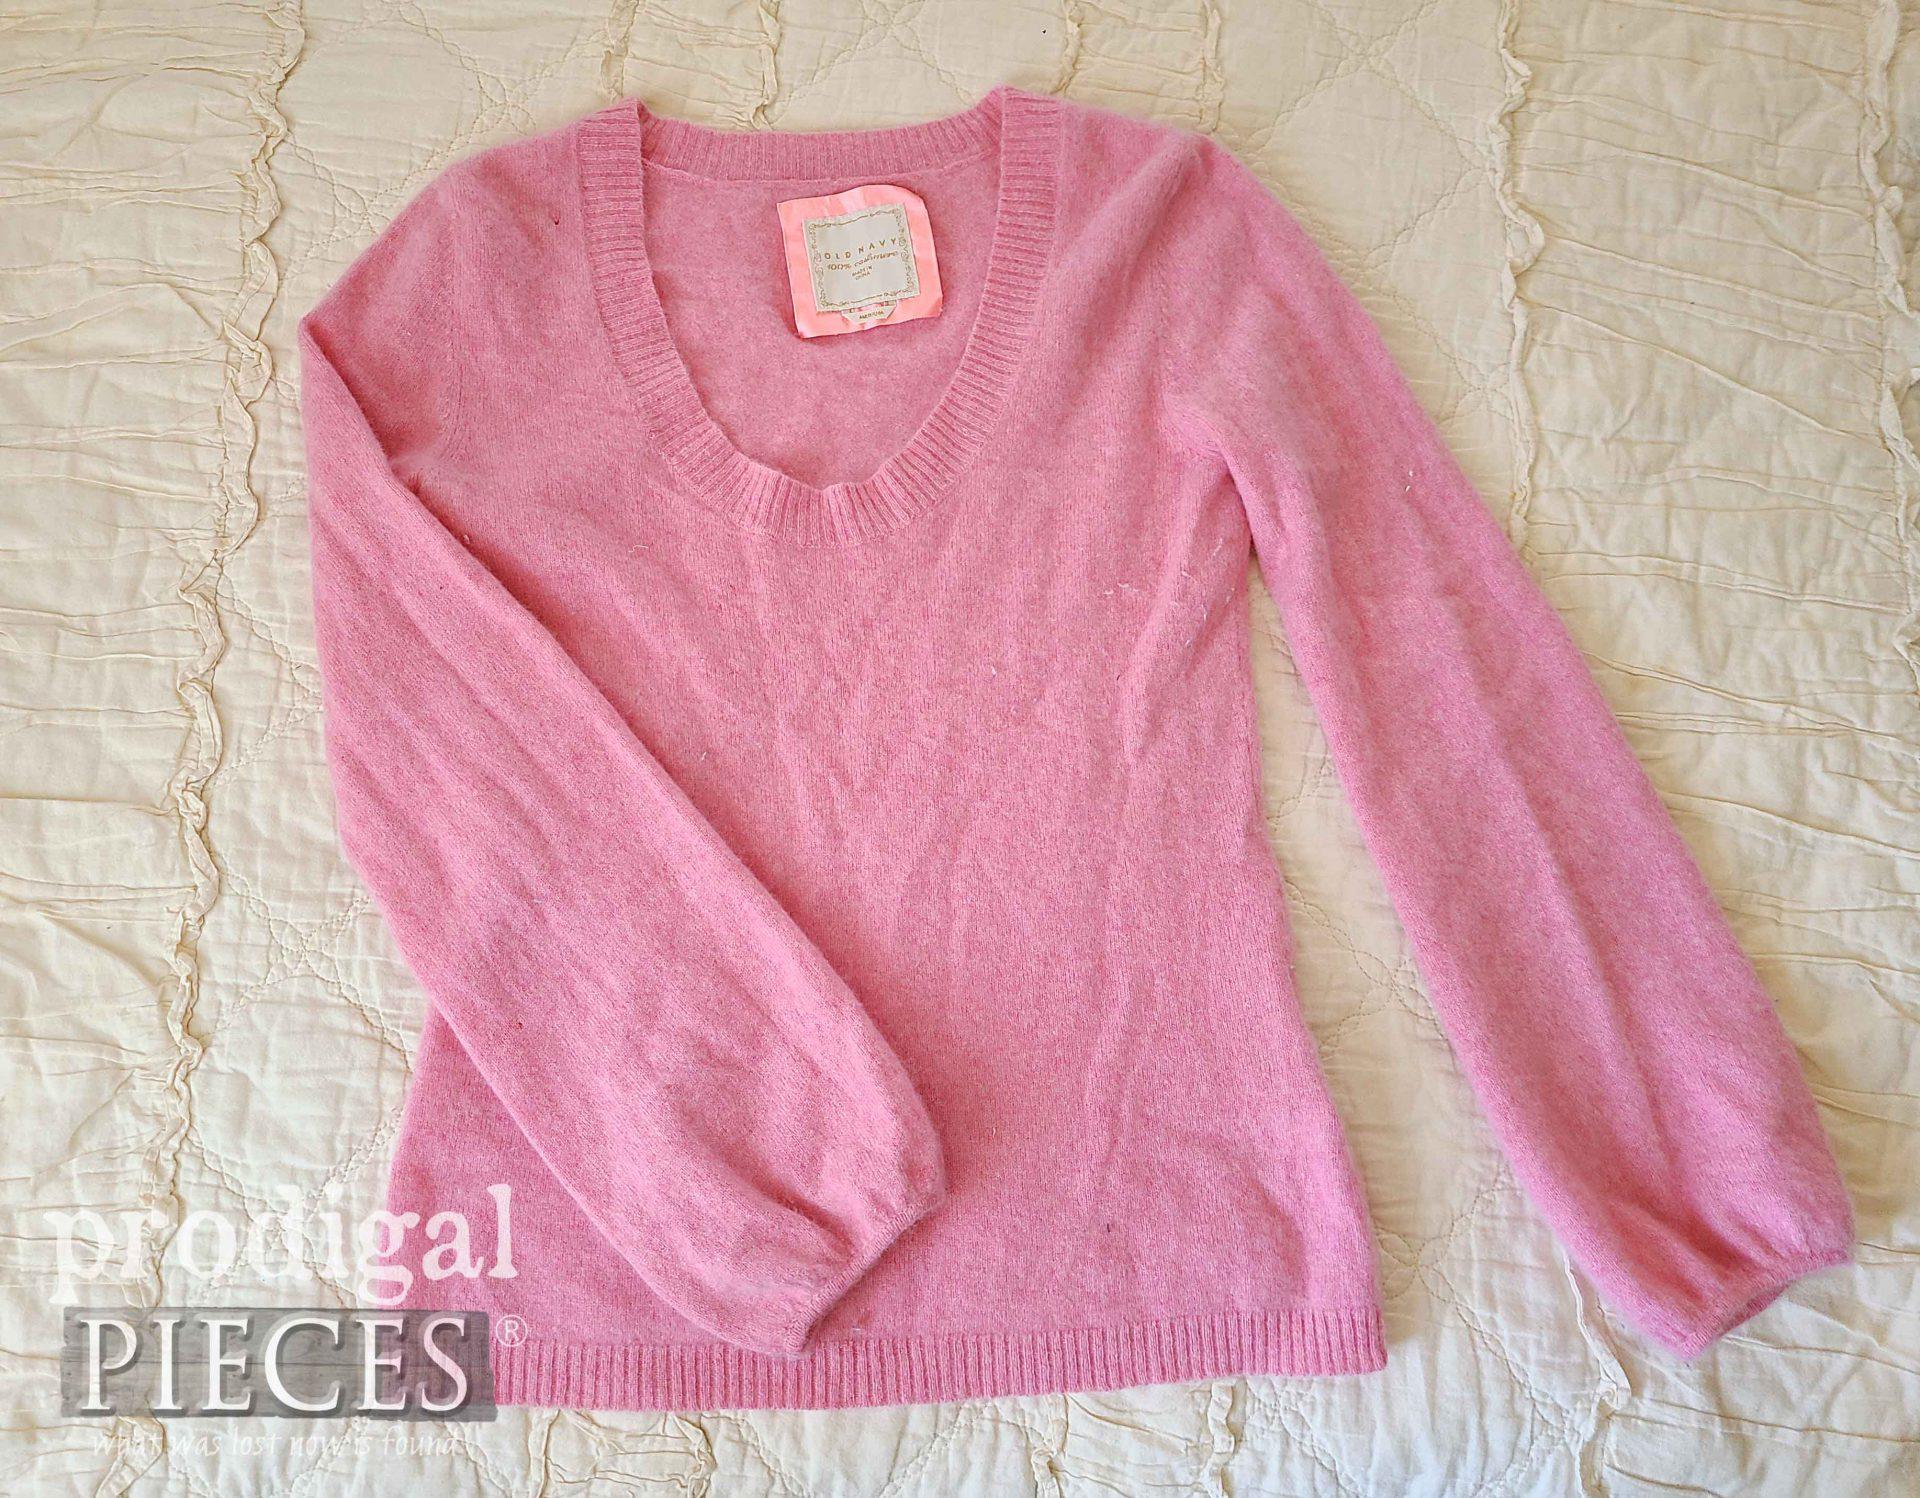 Pink Cashmere Sweater Before Refashion | prodigalpieces.com #prodigalpieces